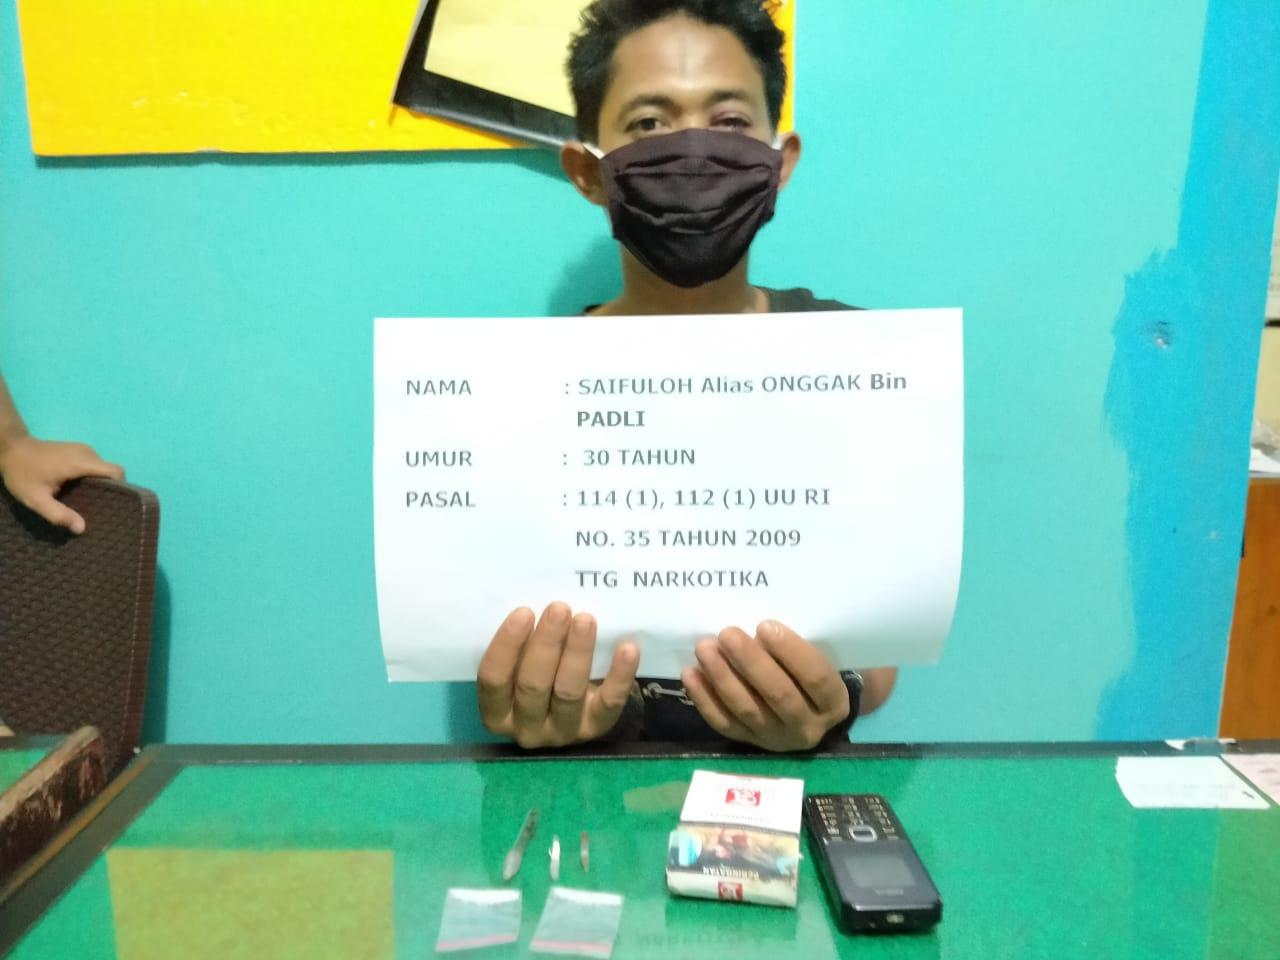 Pelaku bersama barang bukti. Foto: Edo/Jambiseru.com